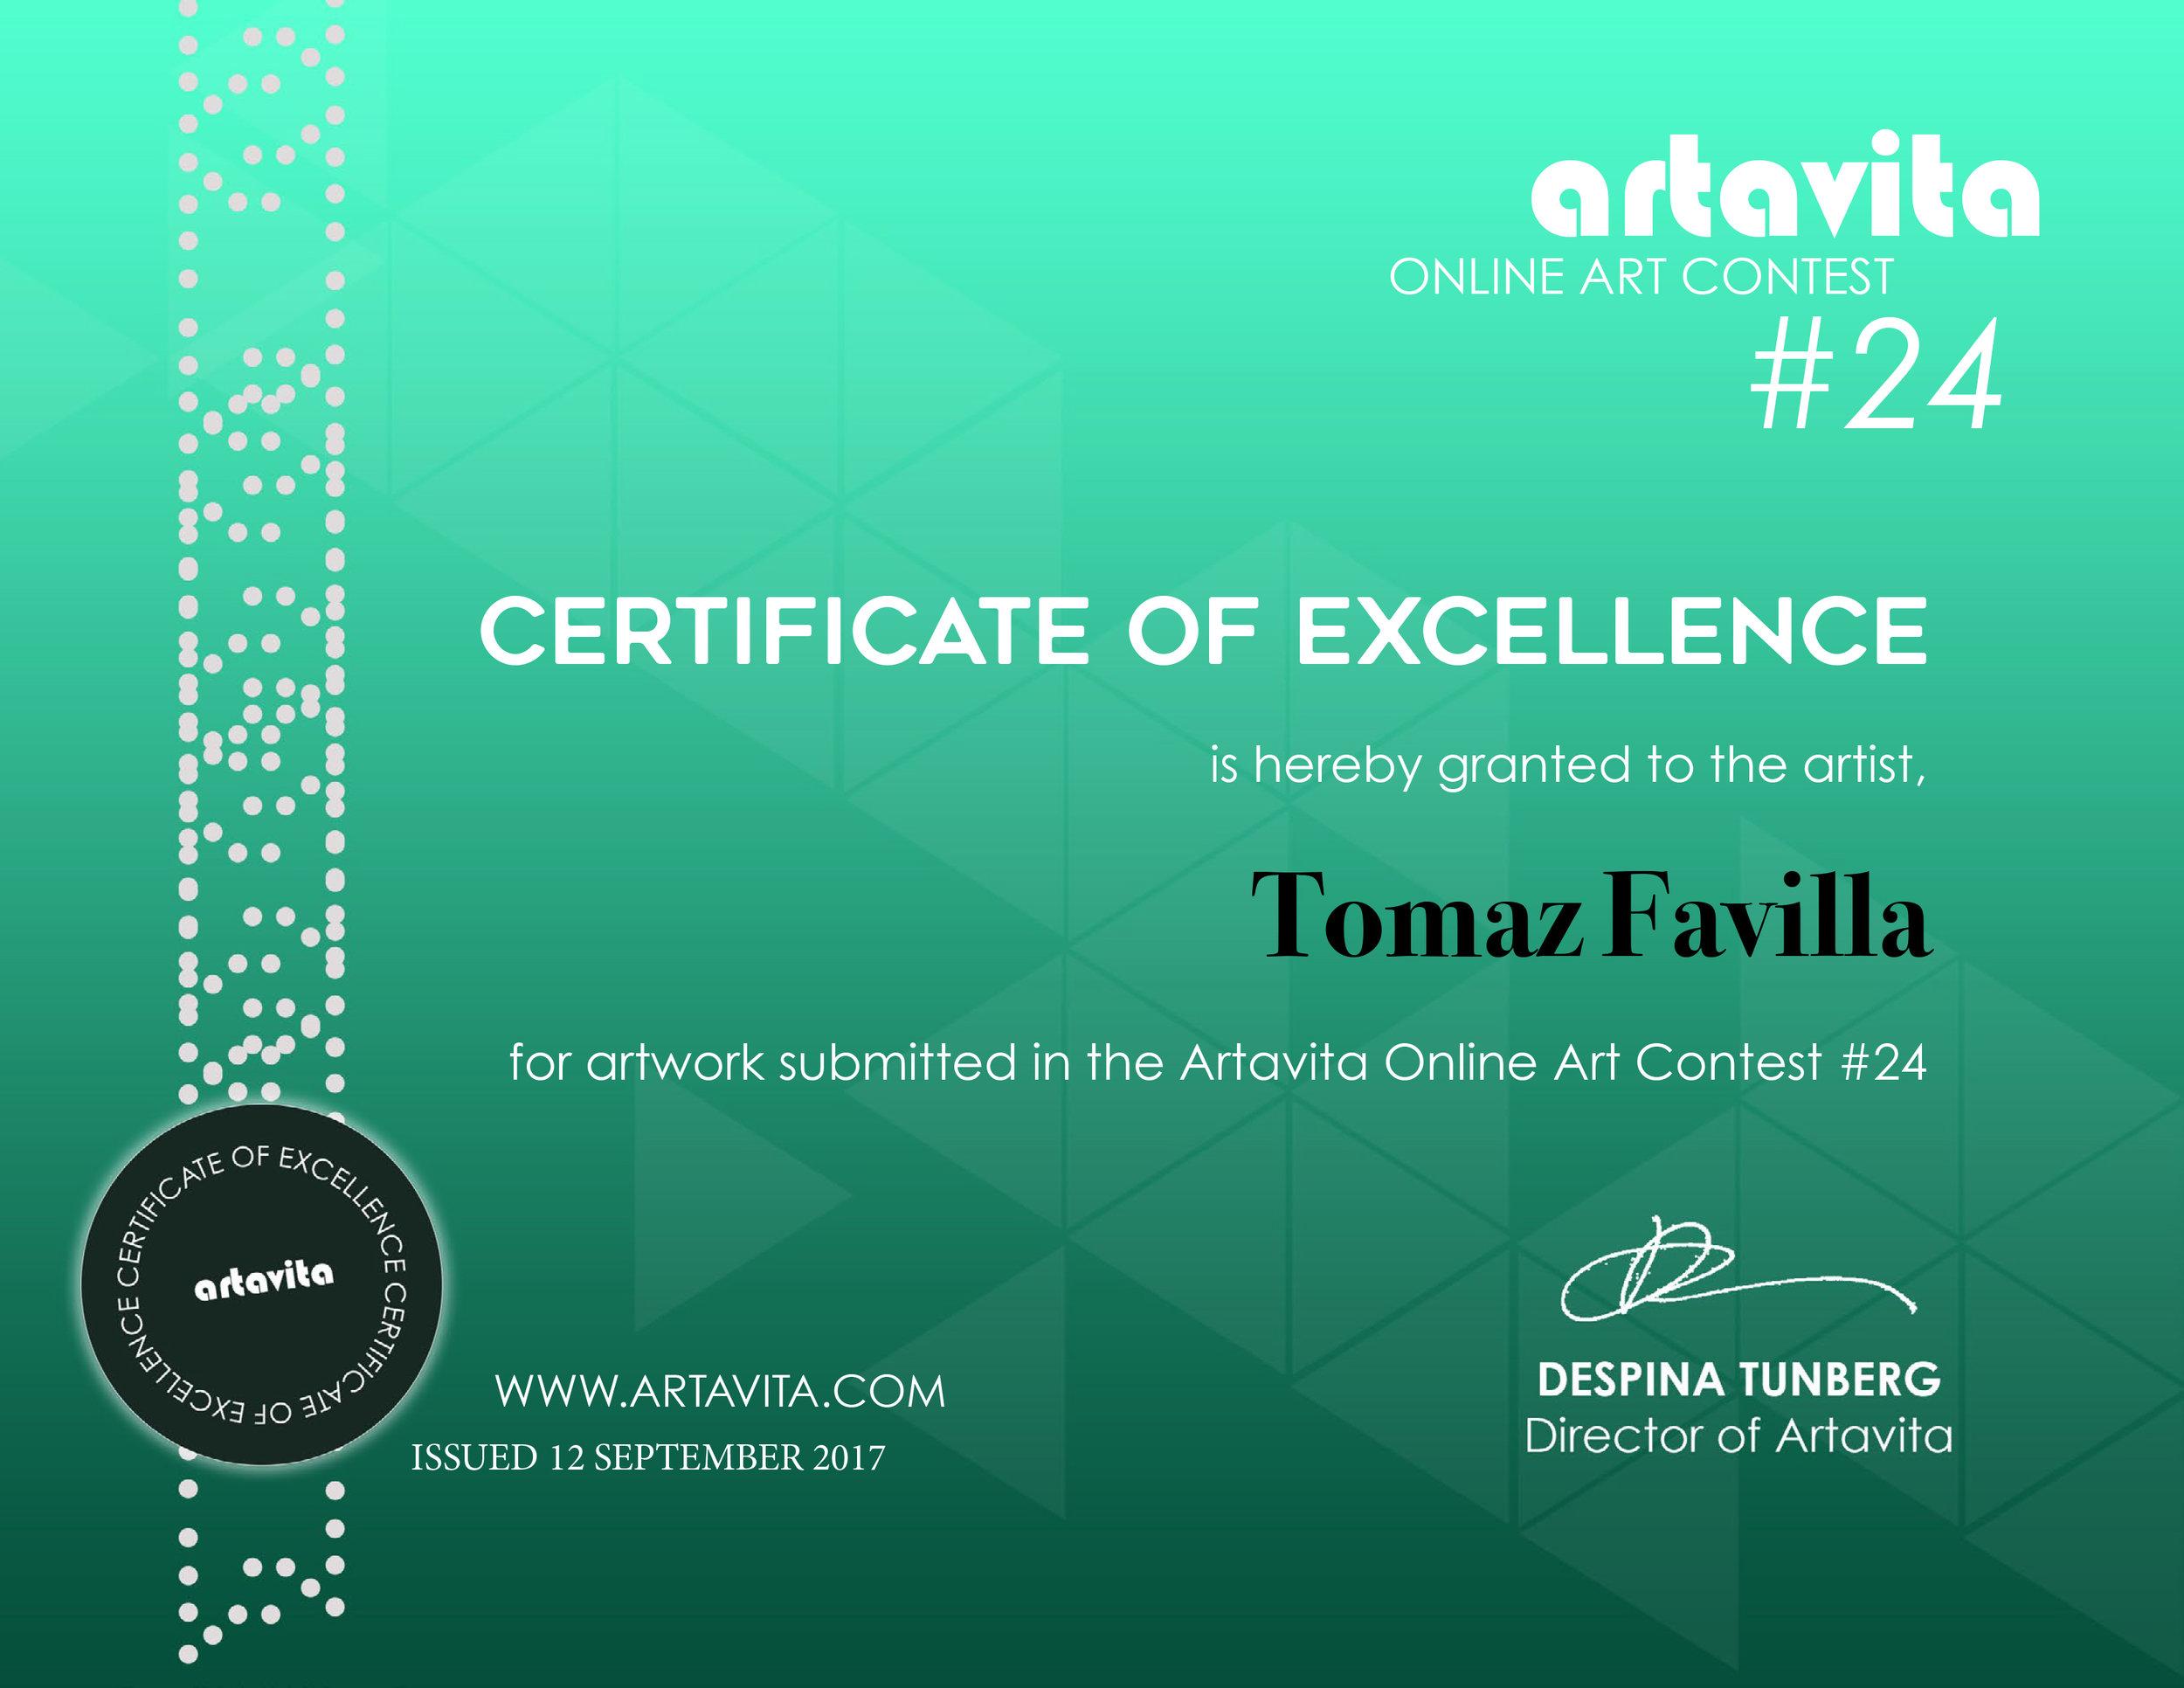 ArtavitaContest24_Certificate_Tomaz Favilla.jpg